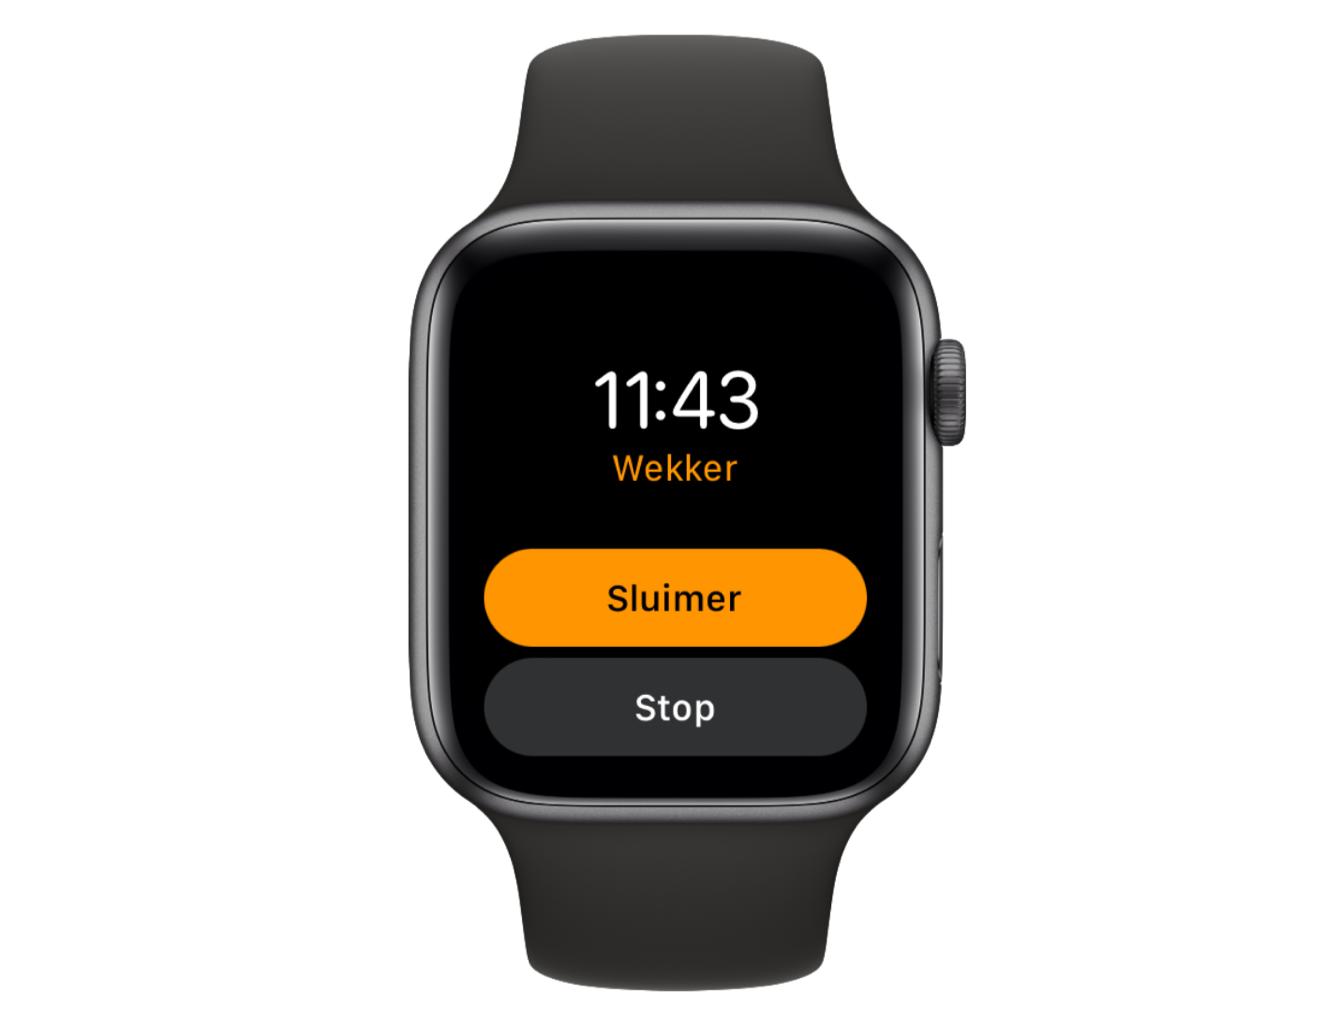 Apple Watch wekker gaat af